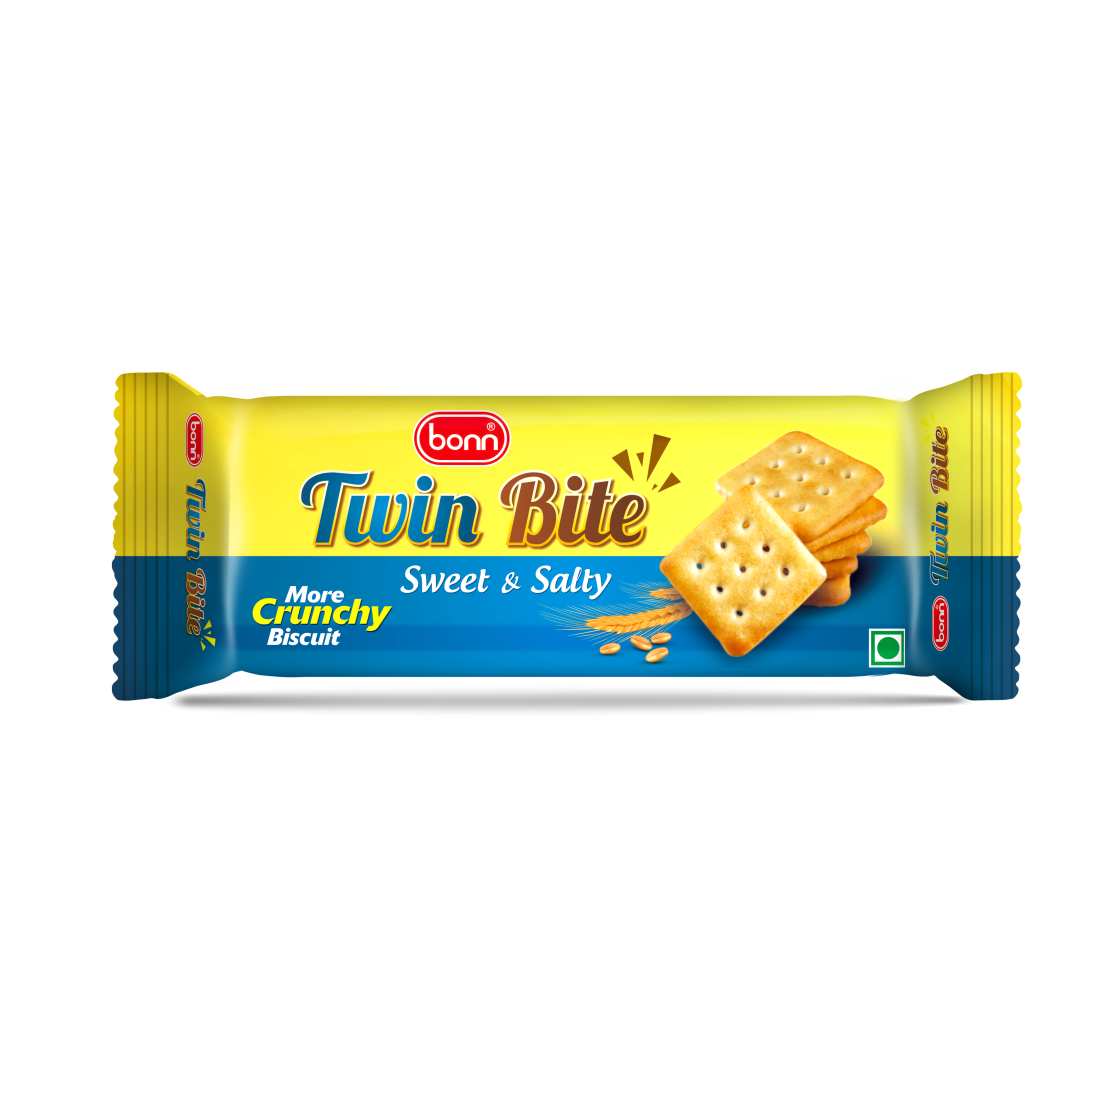 Bonn Twin Bite Sweet & Salty Biscuits